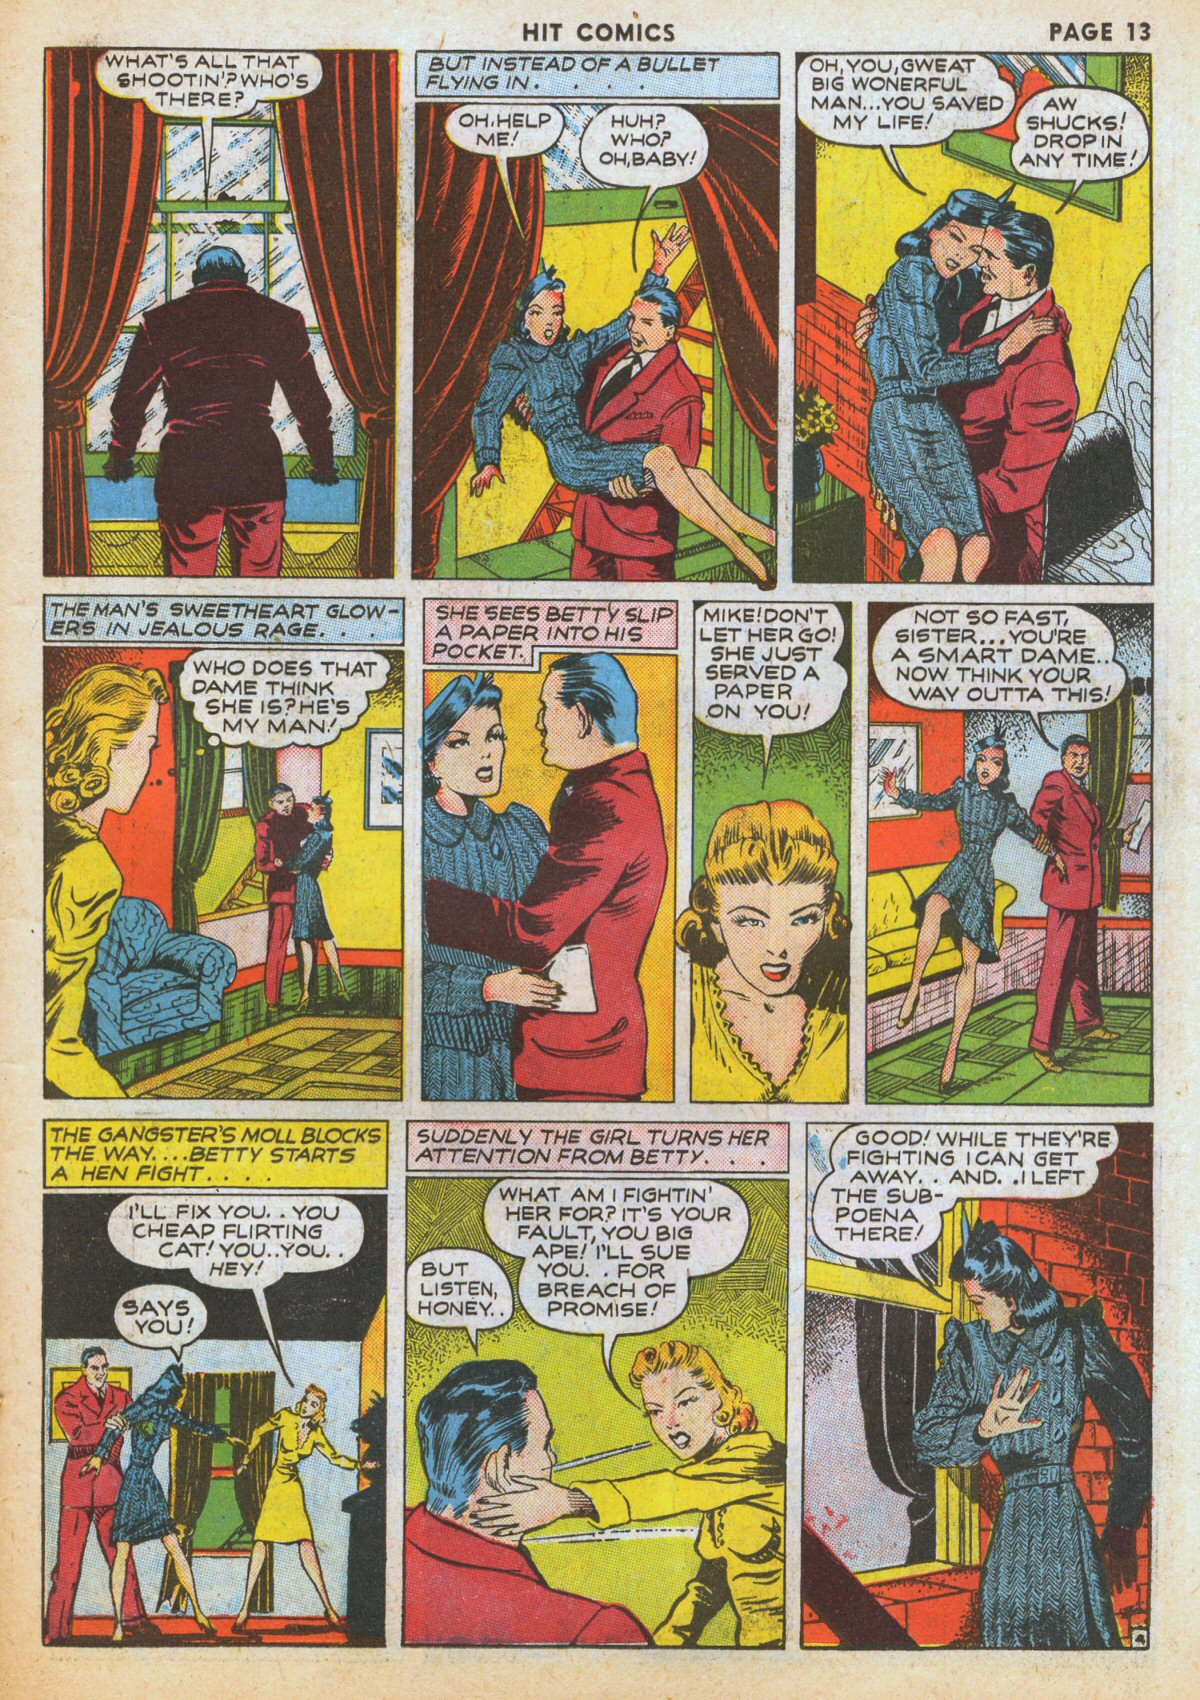 Read online Hit Comics comic -  Issue #12 - 15